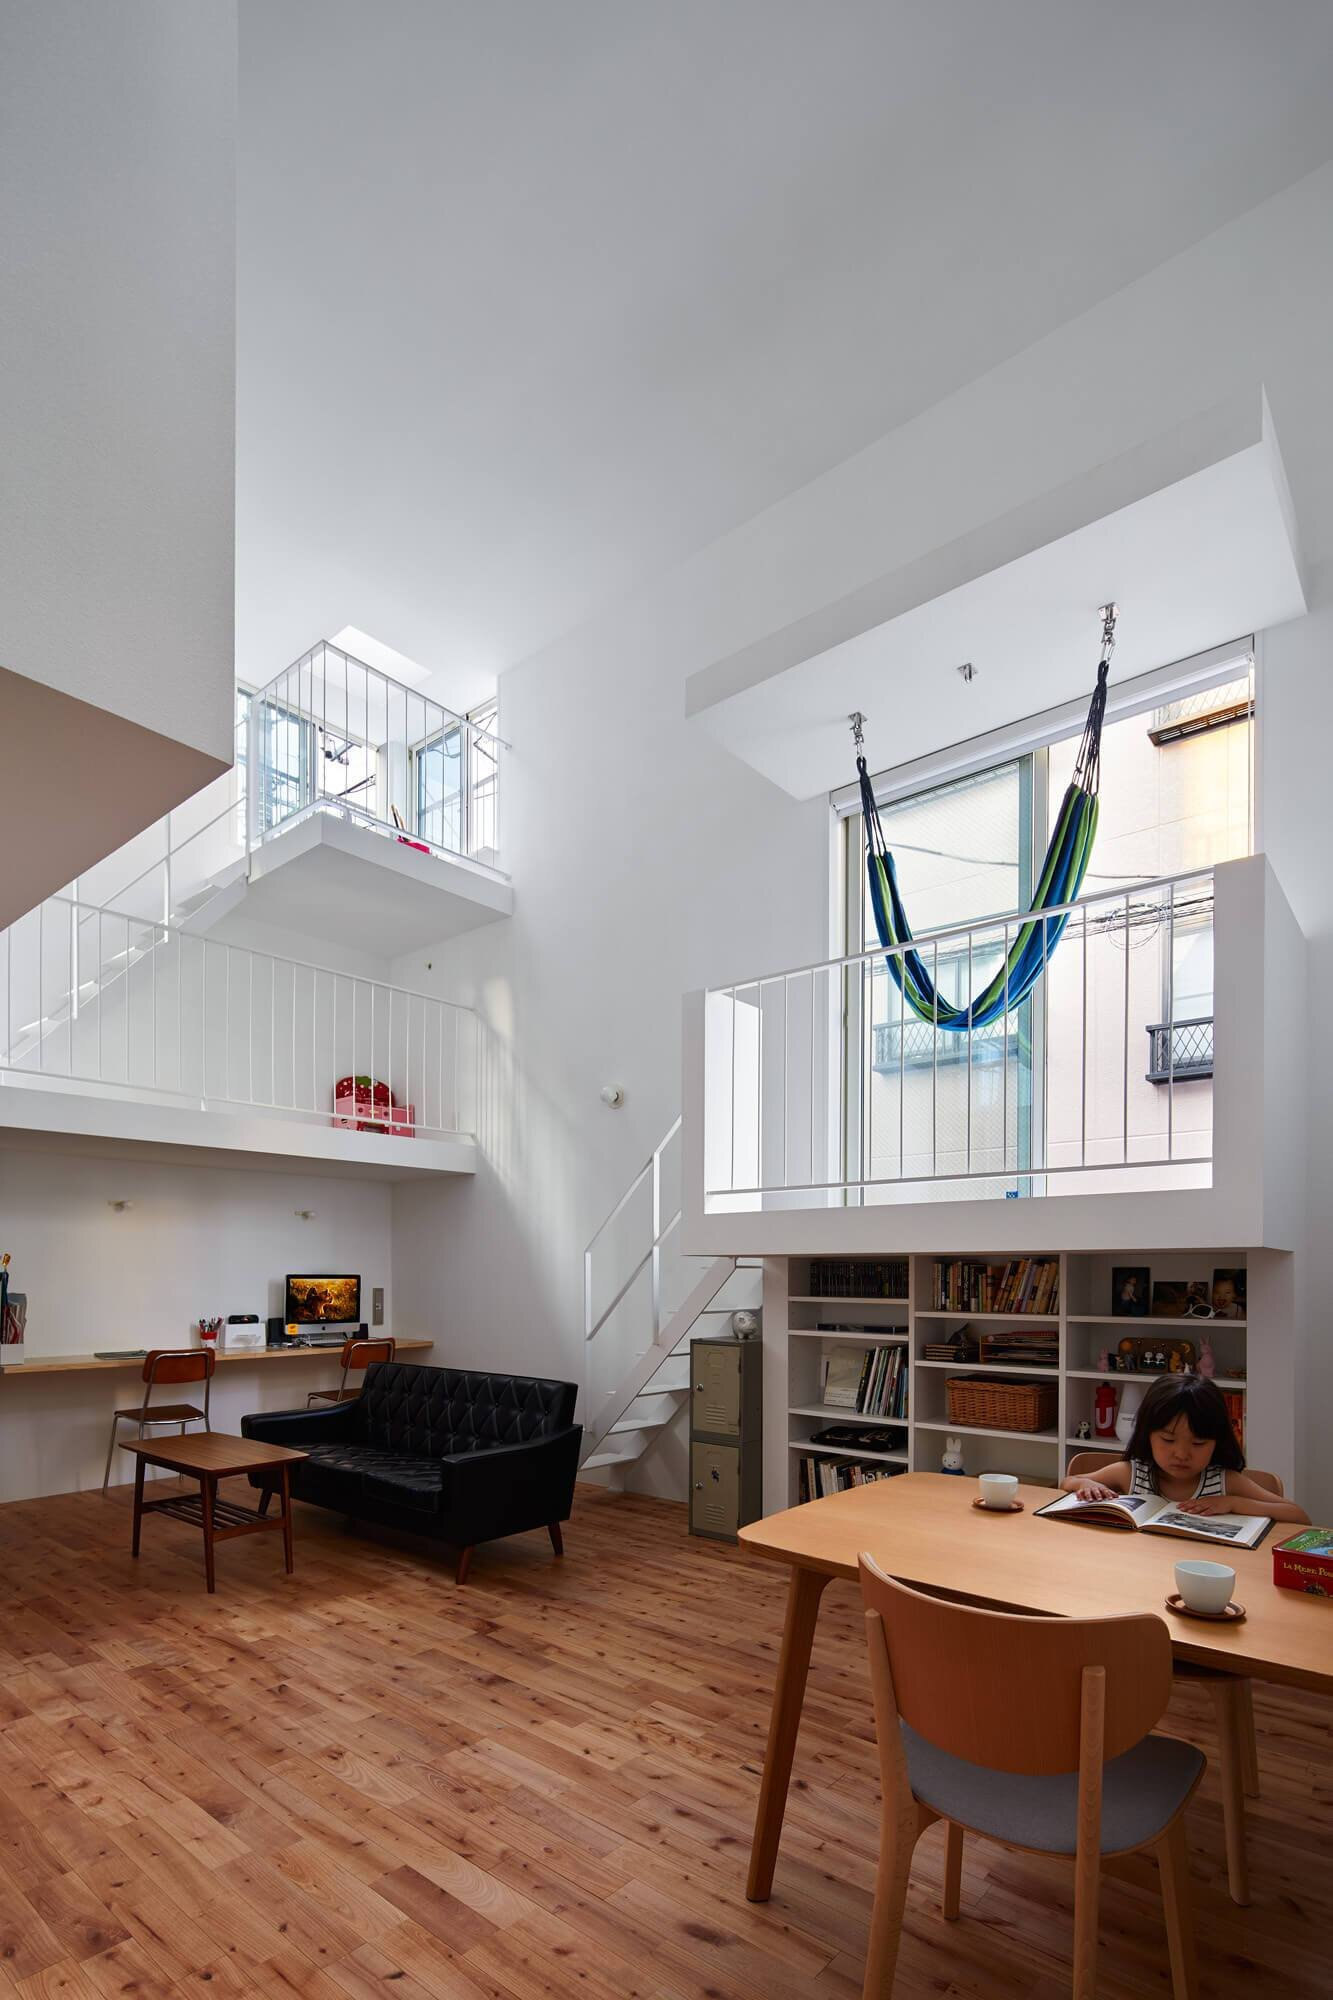 Balcony-House-Takeshi-Hosaka-Architects-Japan-23